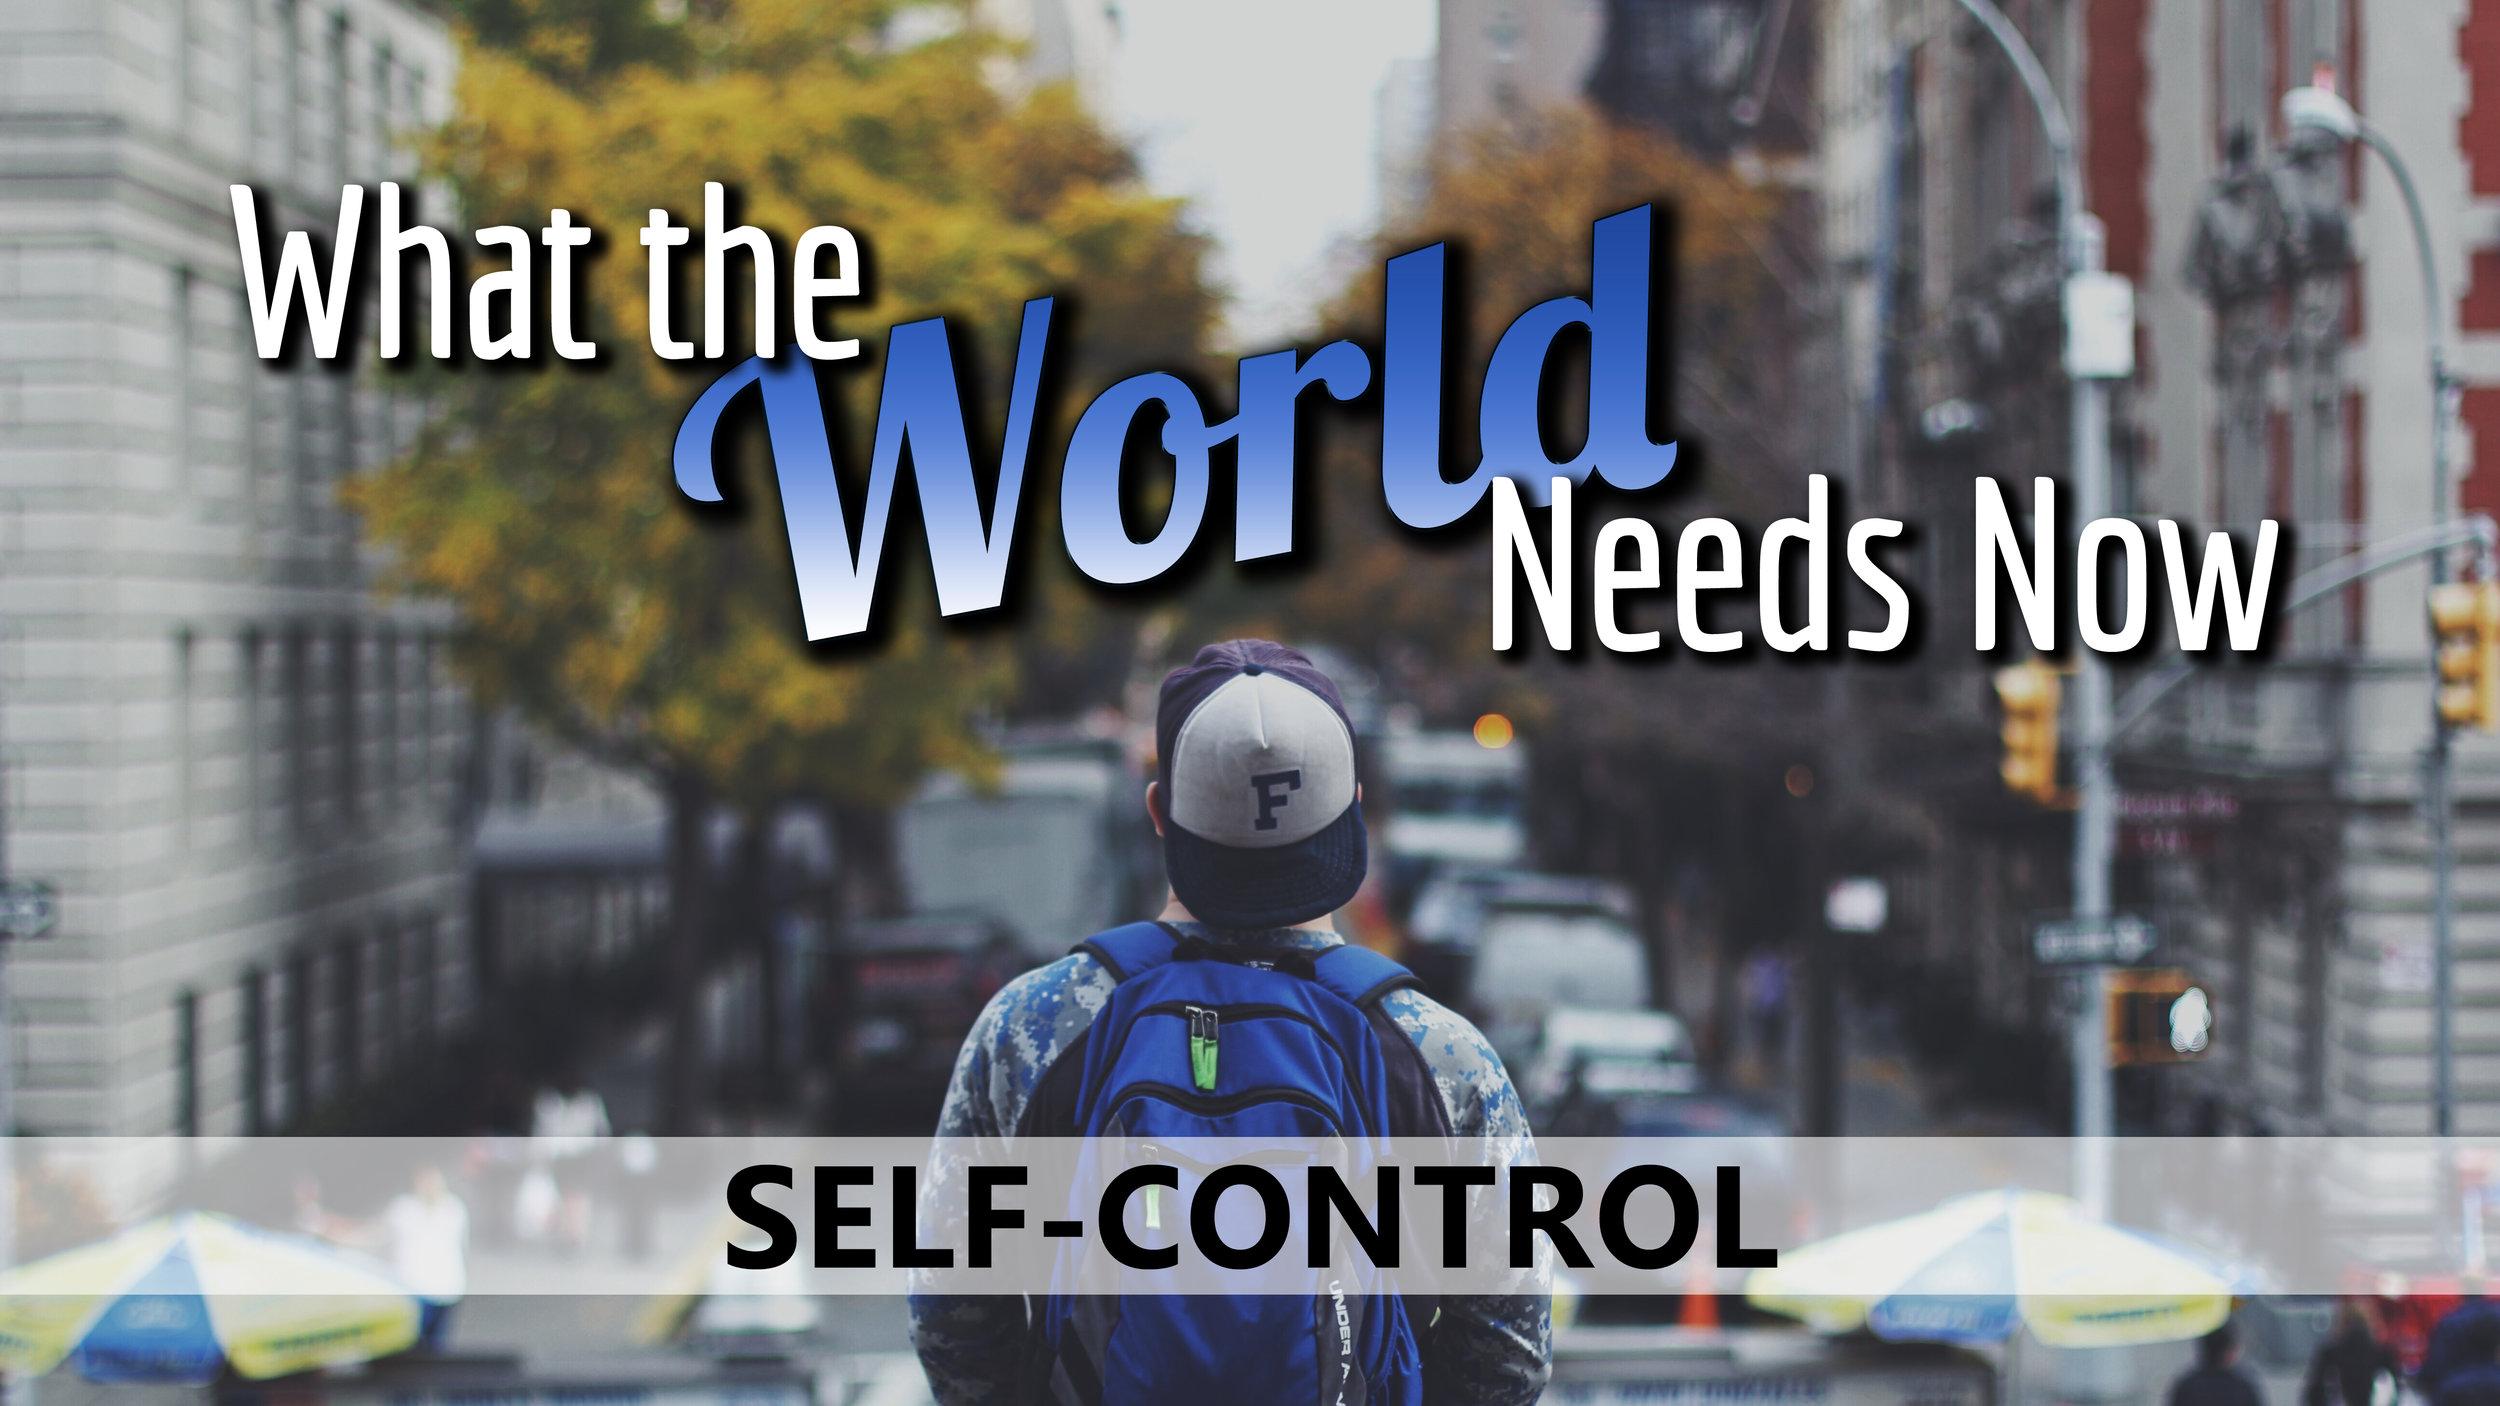 1. Self-Control.jpg